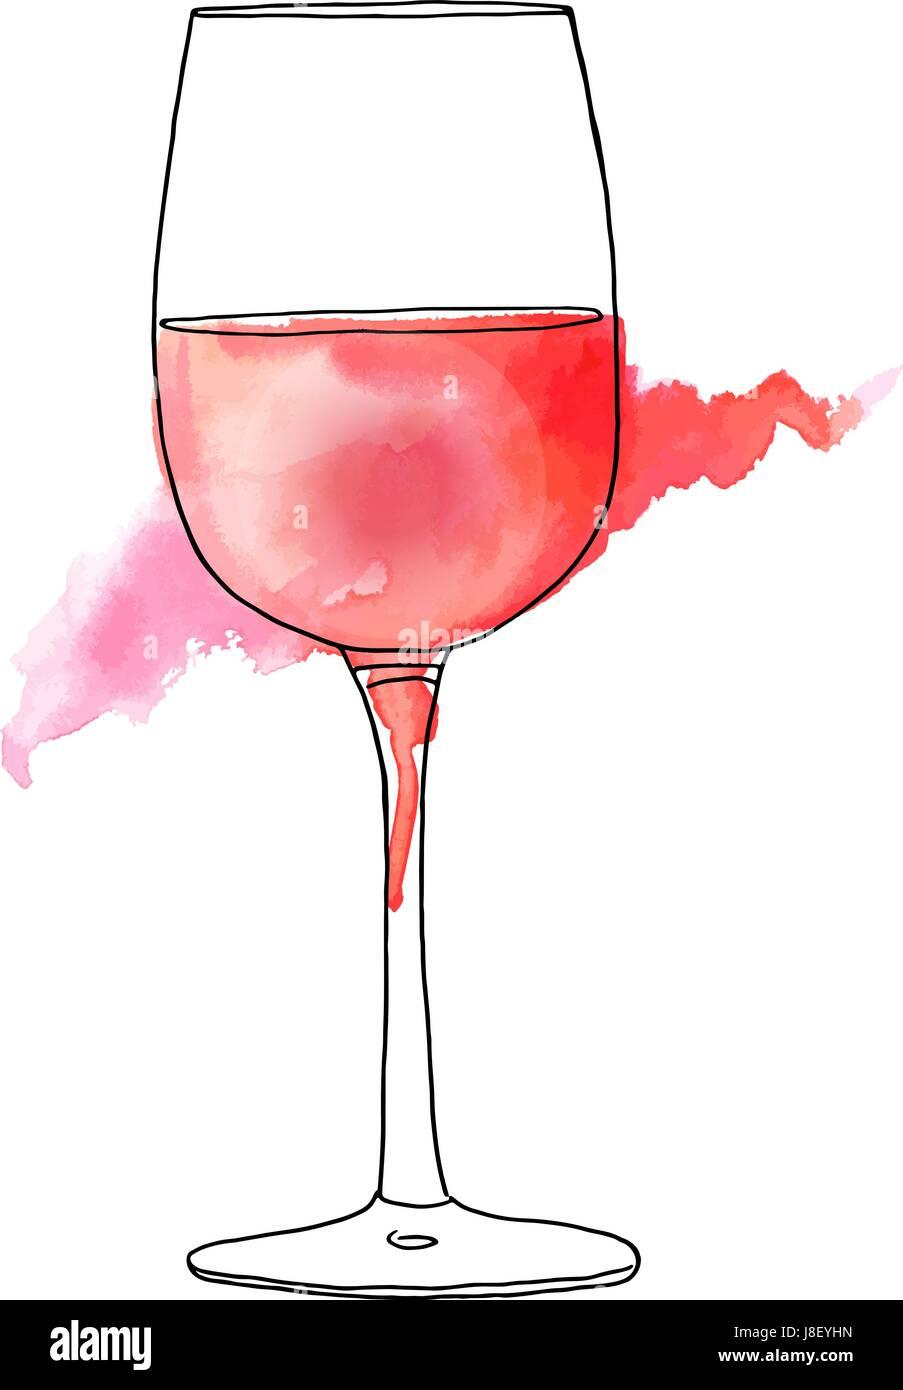 Sc nario et dessin aquarelle de verre de vin rose vecteurs - Dessin de verre ...